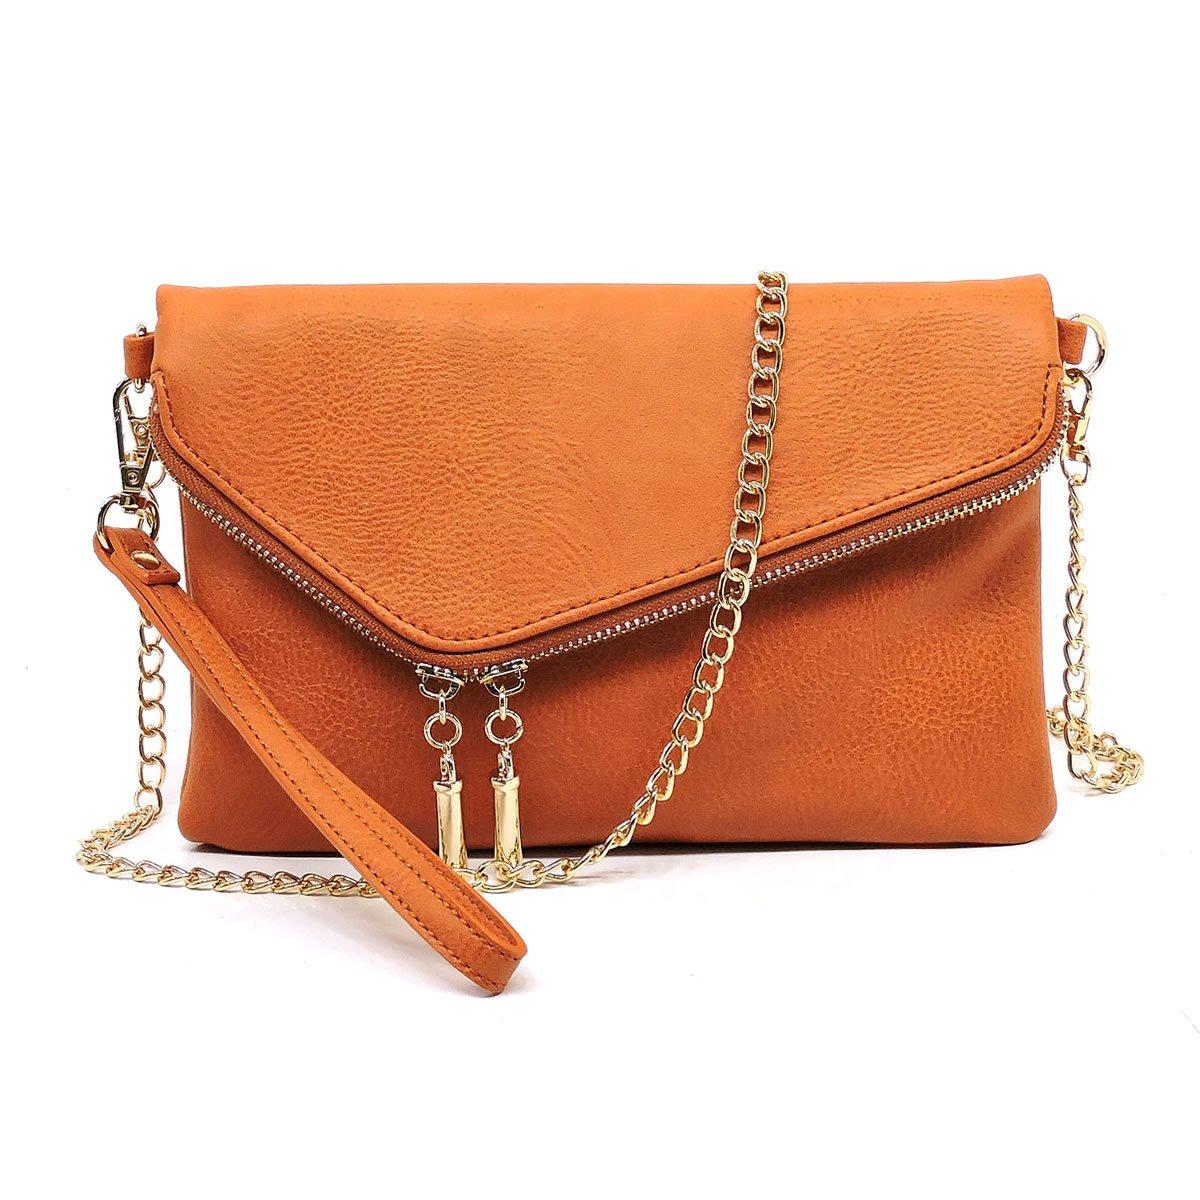 Image of Luxe Crossbody Bag